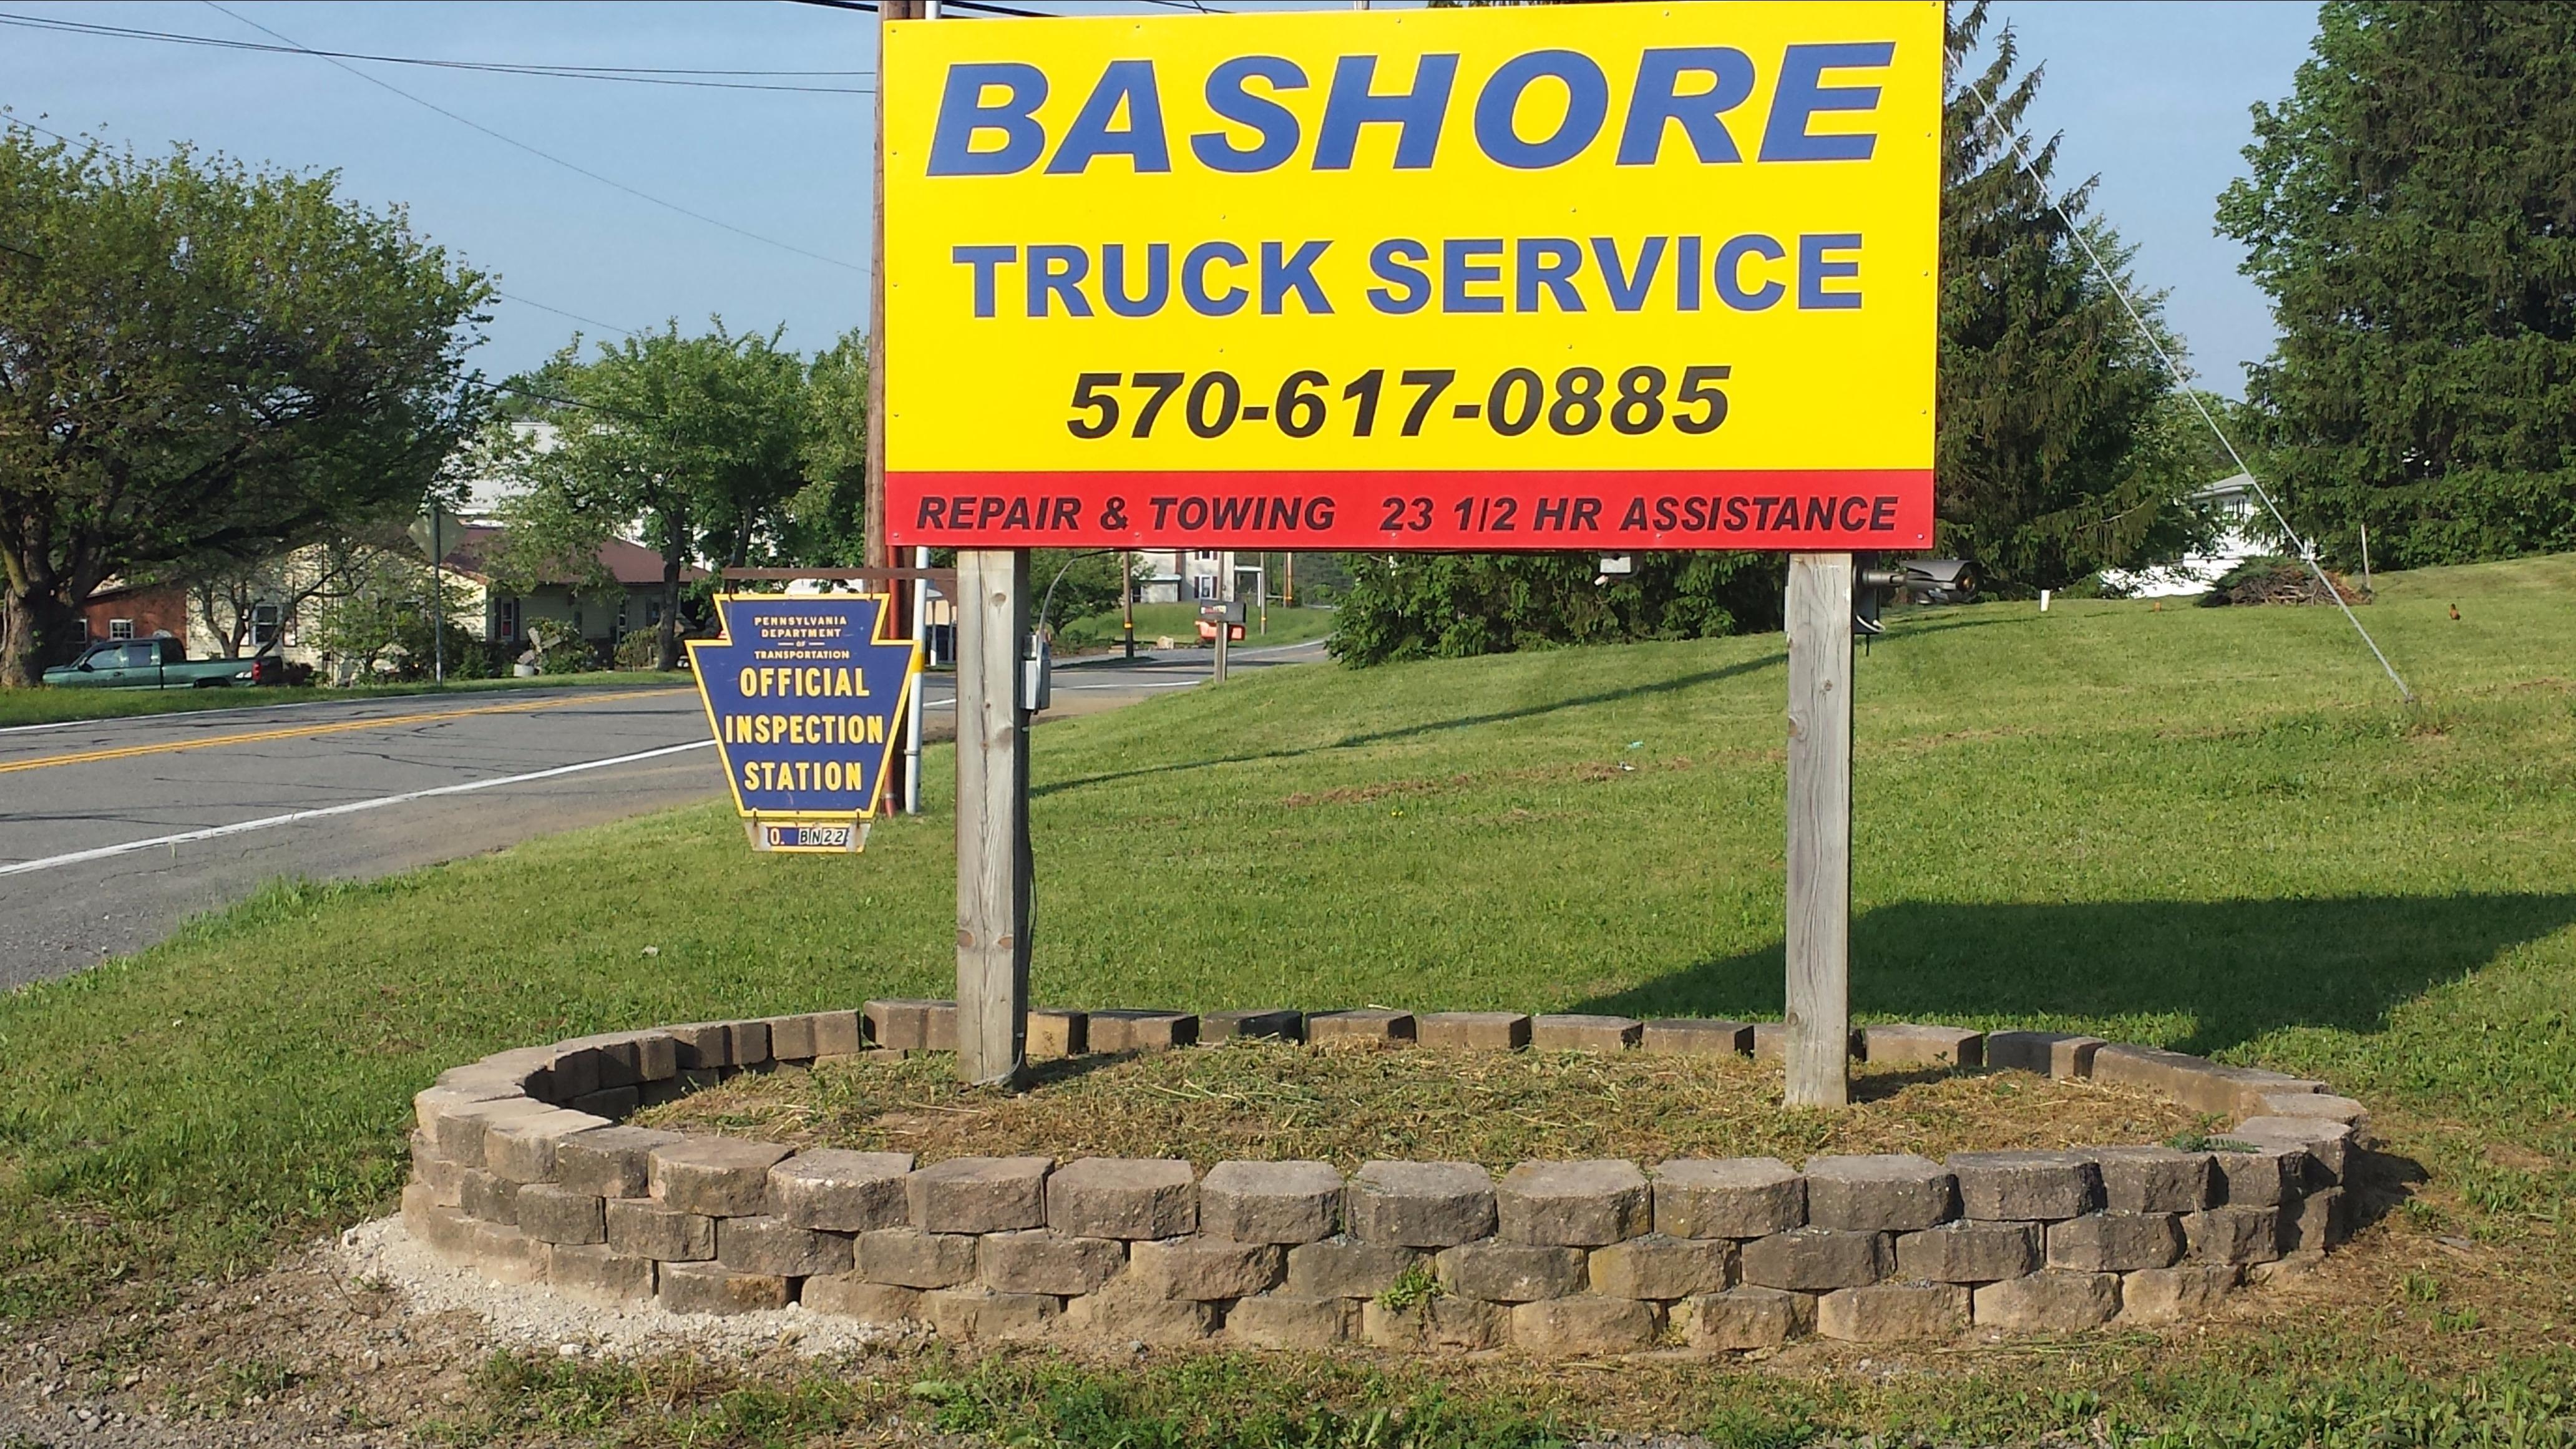 Bashore Truck service image 1